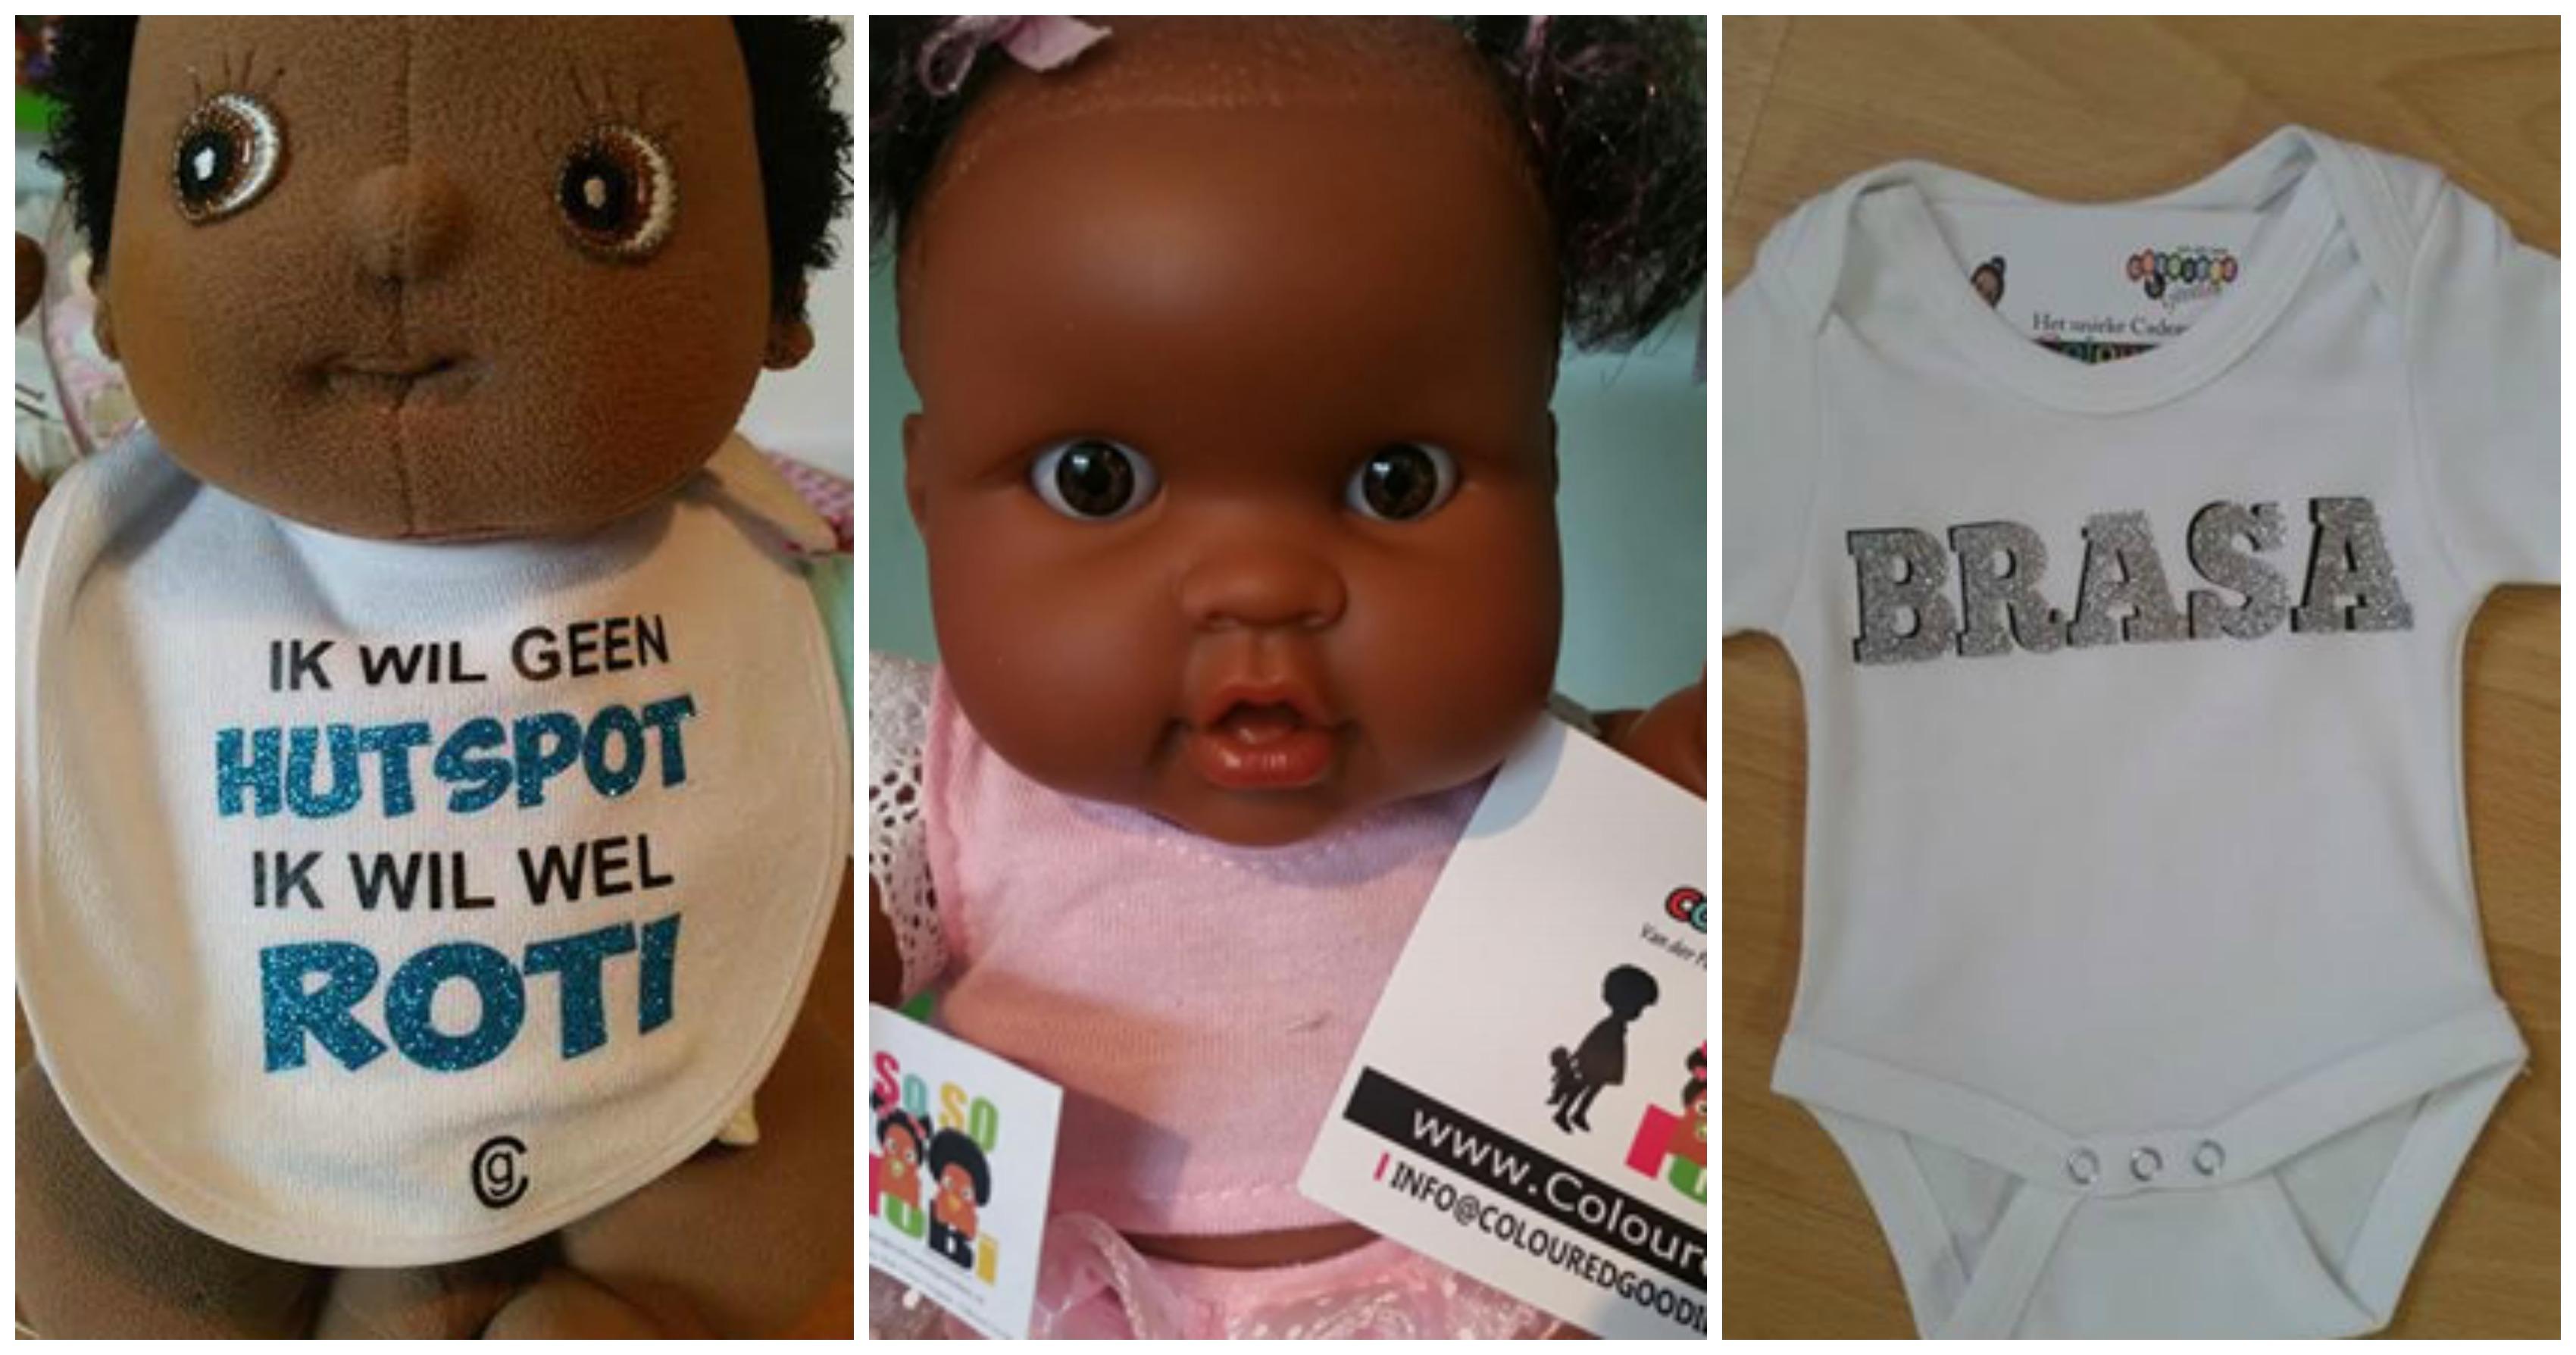 Coloured-Goodies-donkere-poppen-Afrikaanse-kleding-GoodGirlsCompany